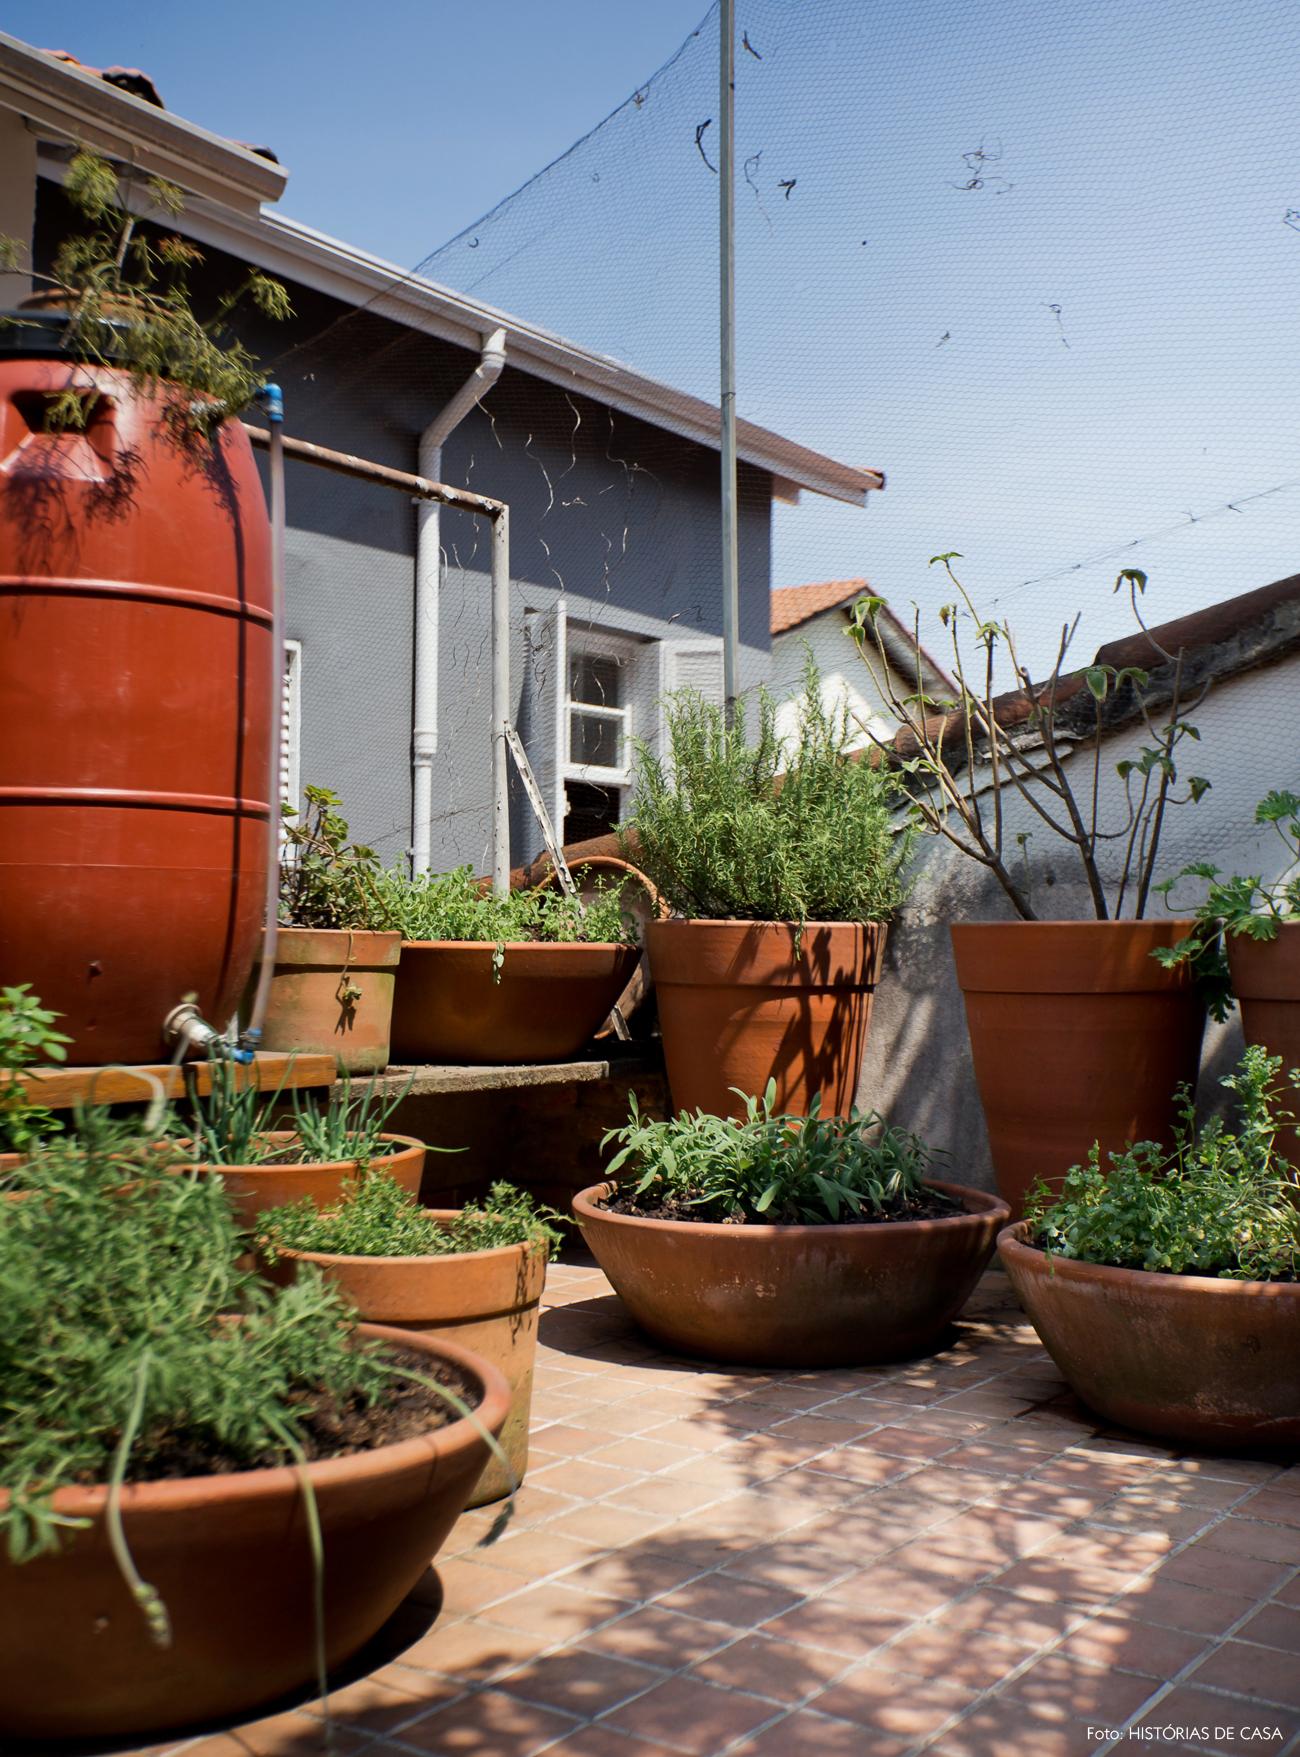 28-decoracao-area-externa-horta-caseira-com-vasos-barro